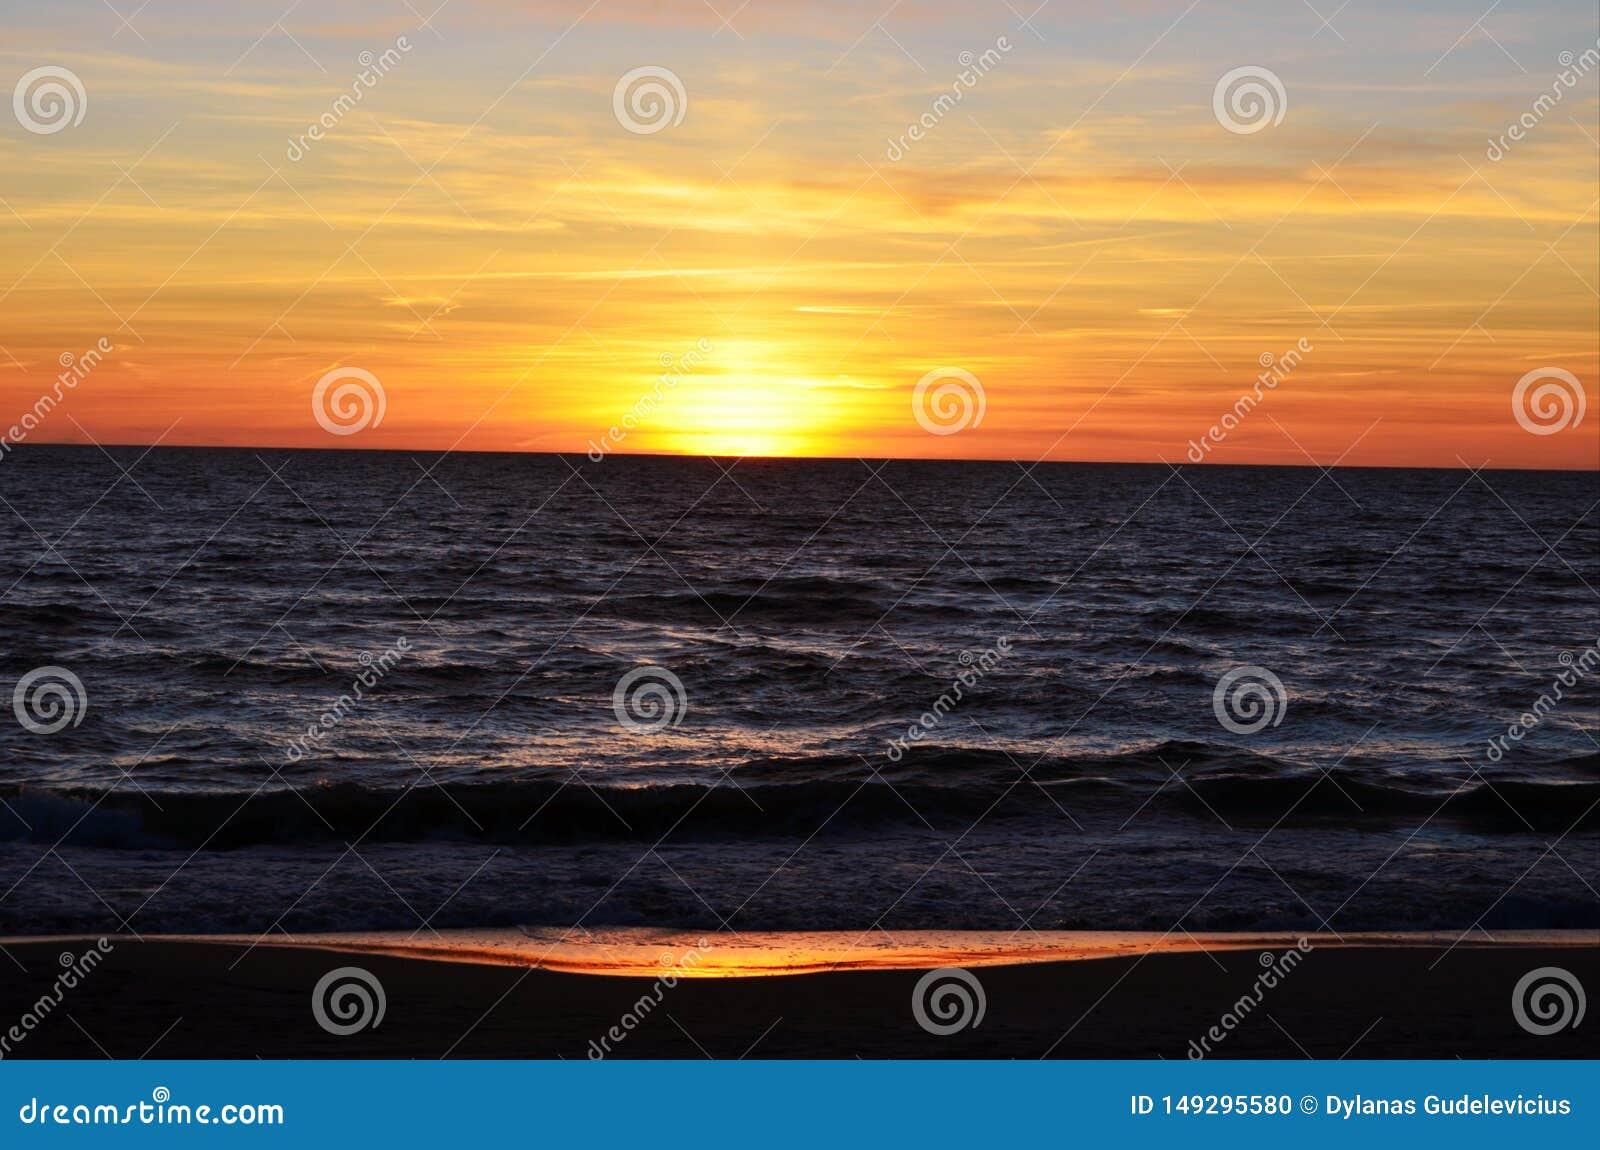 Baltic sea and sky nature